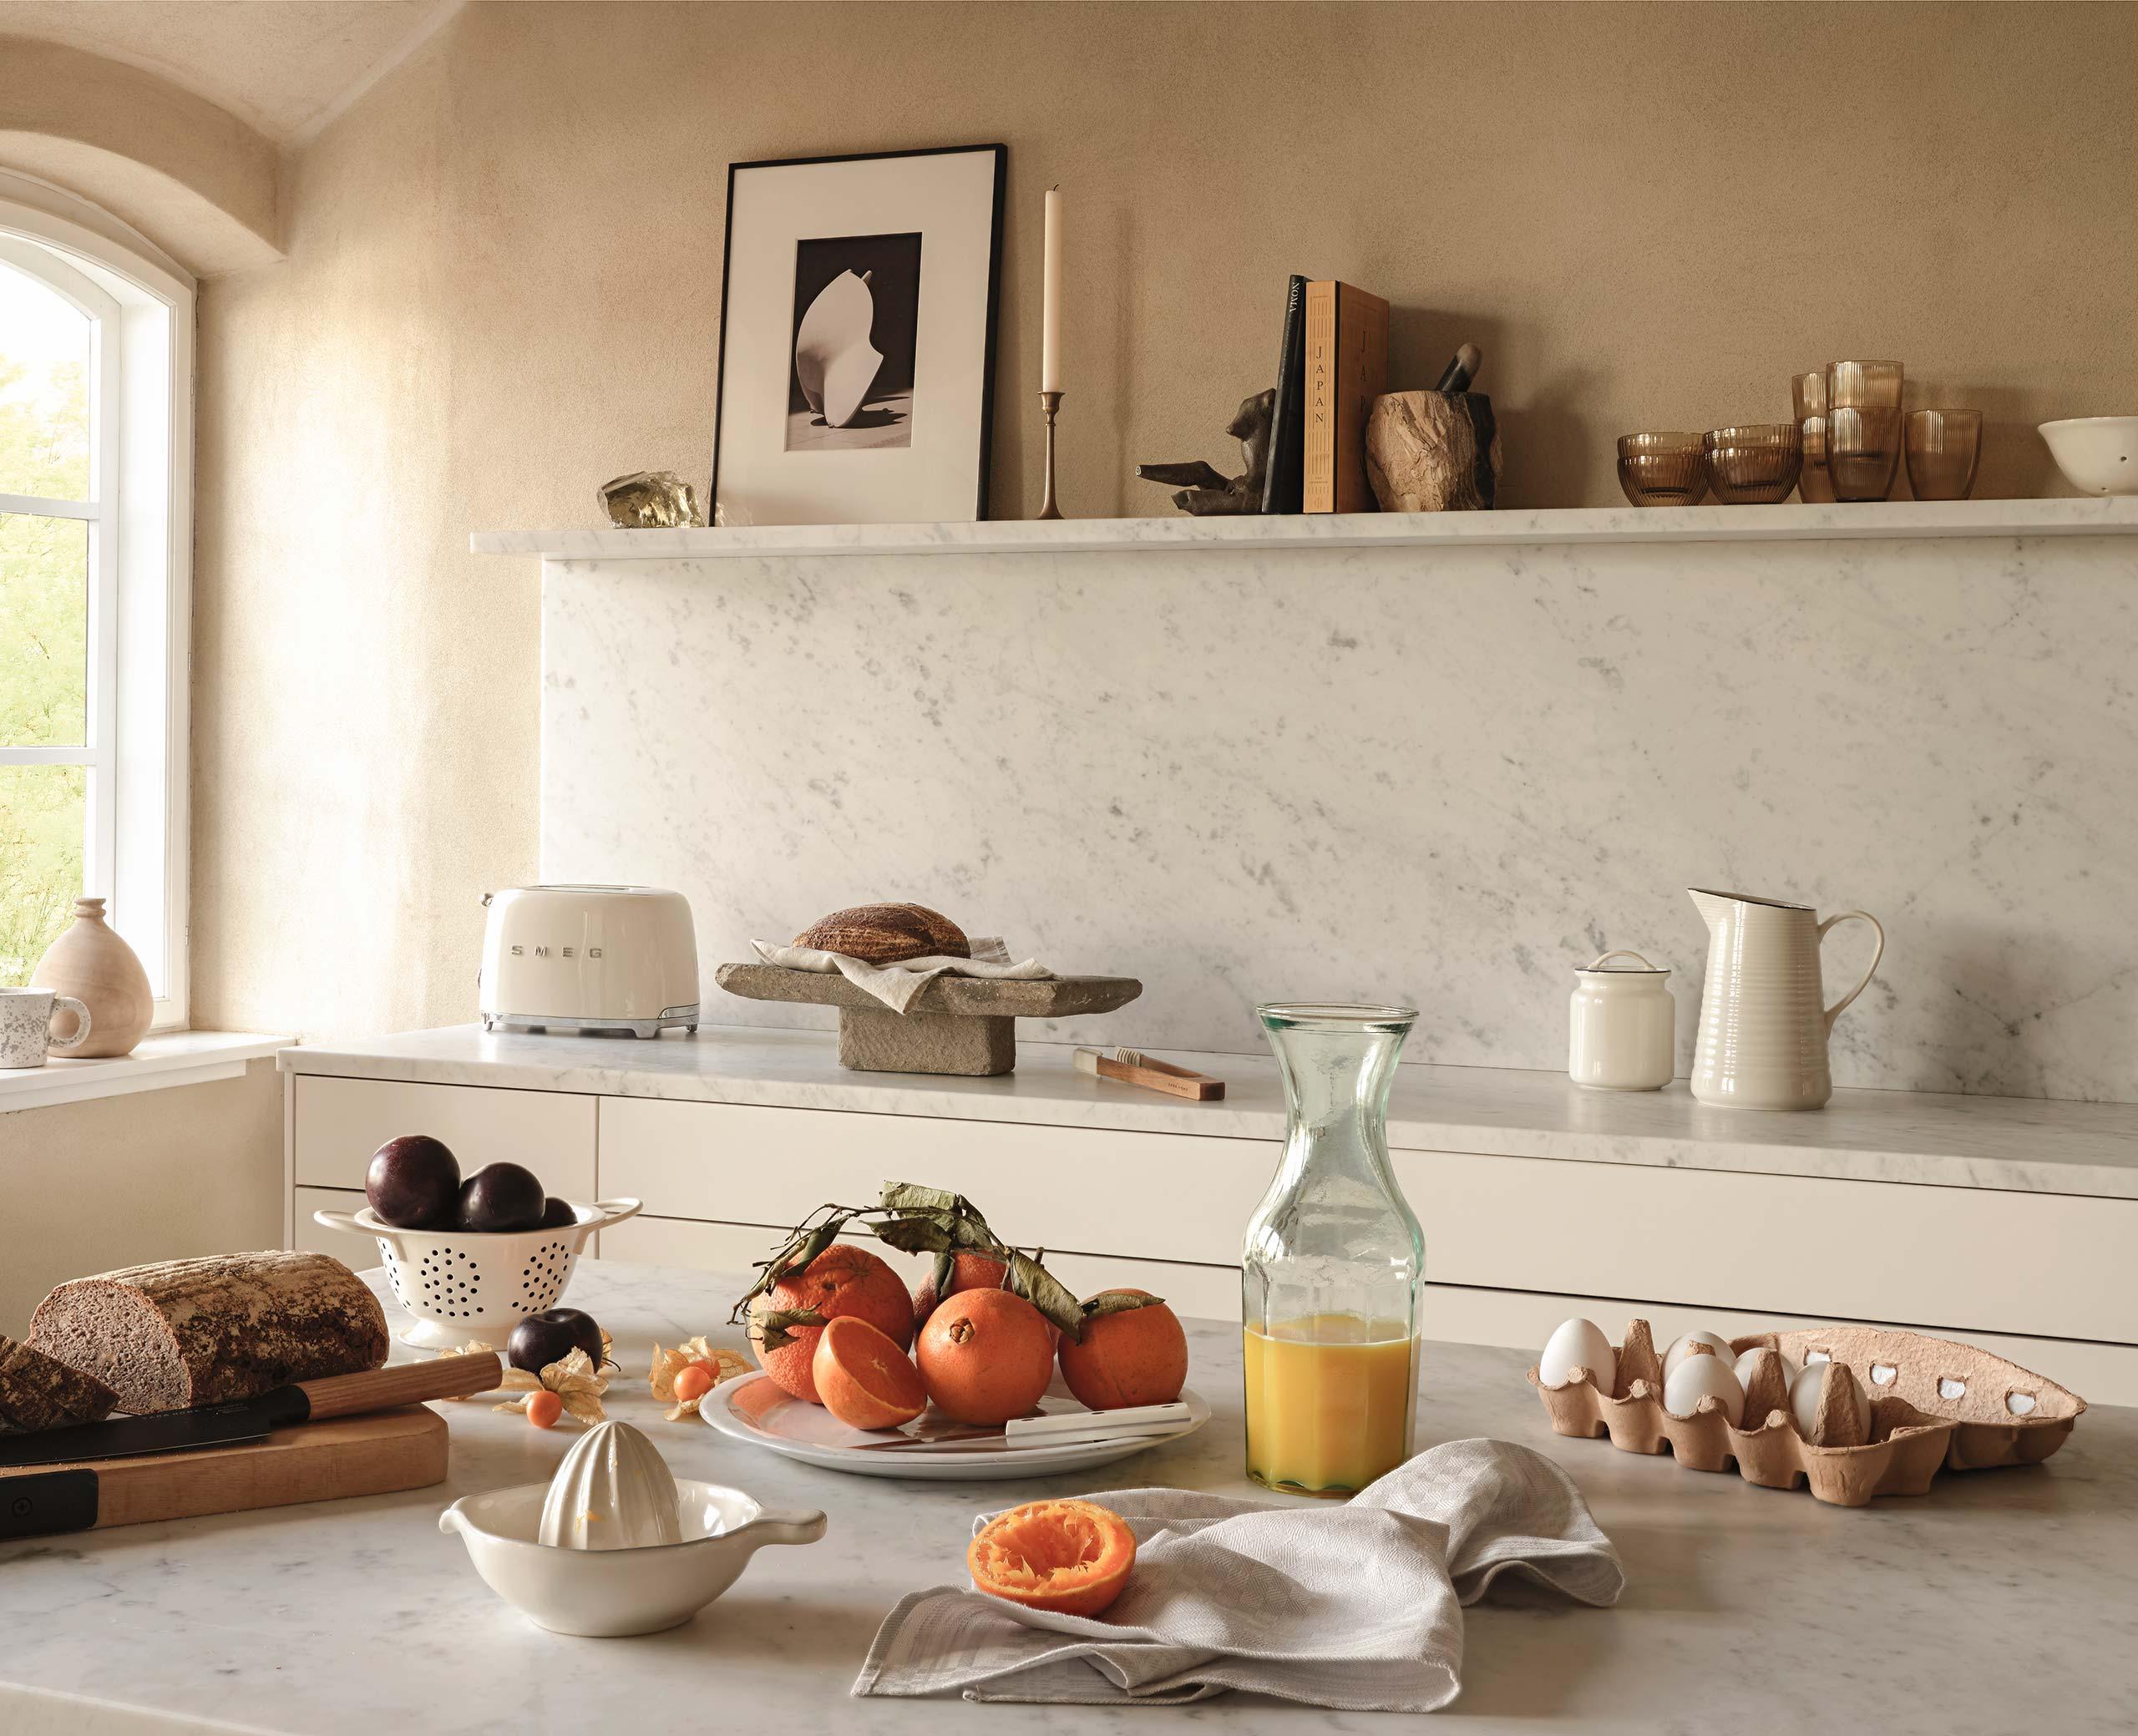 Zara Home FW 2019 tableware